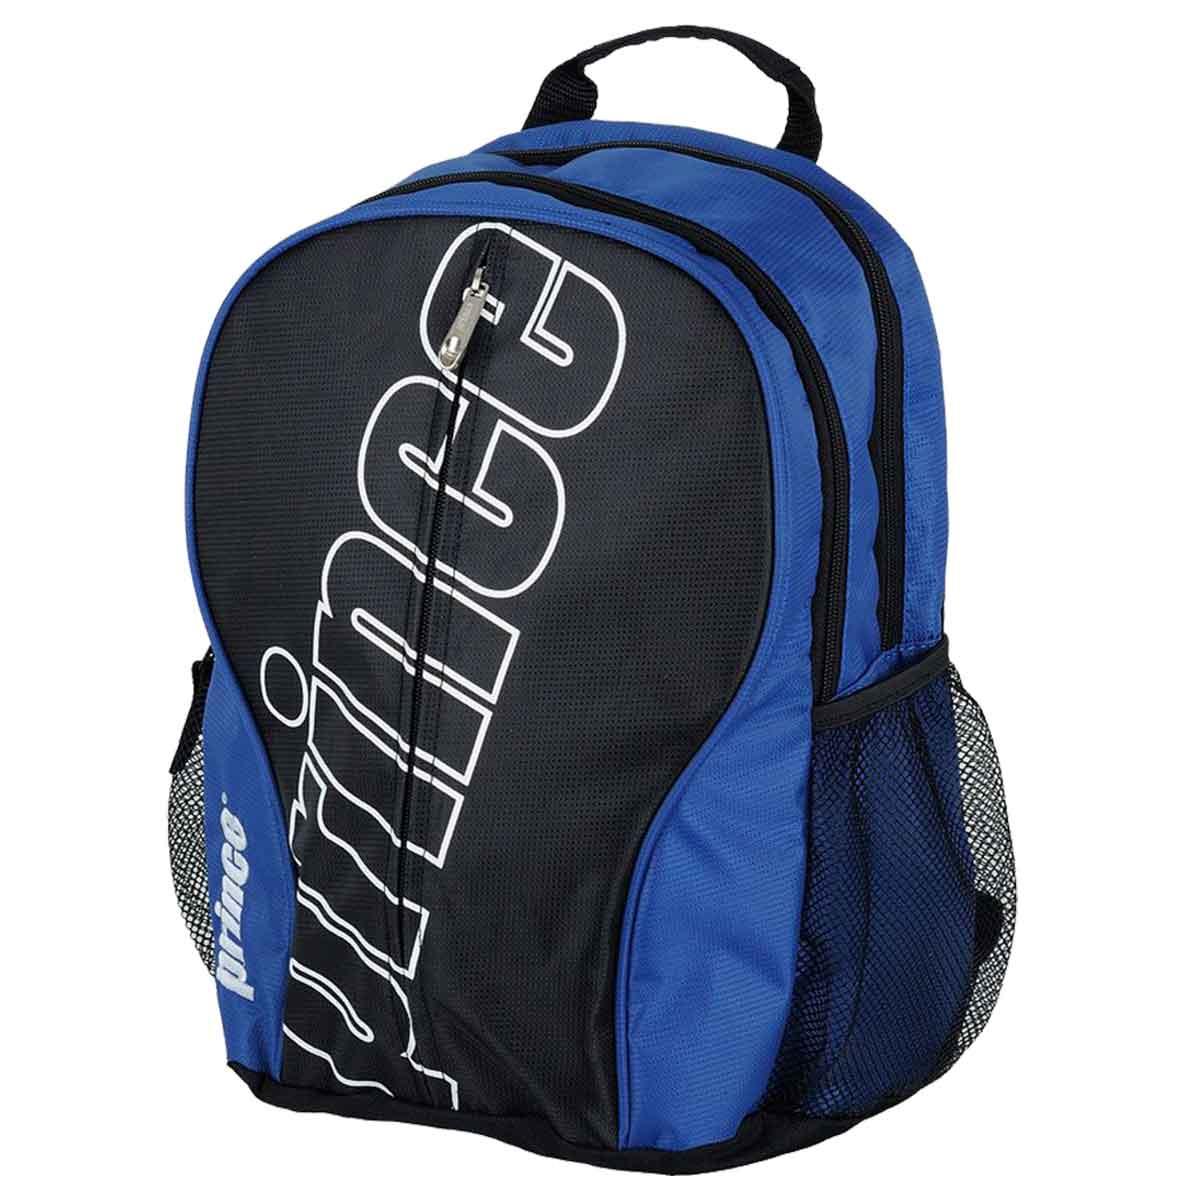 Buy Prince Racquet Pack Lite Tennis Backpack (Royal Blue